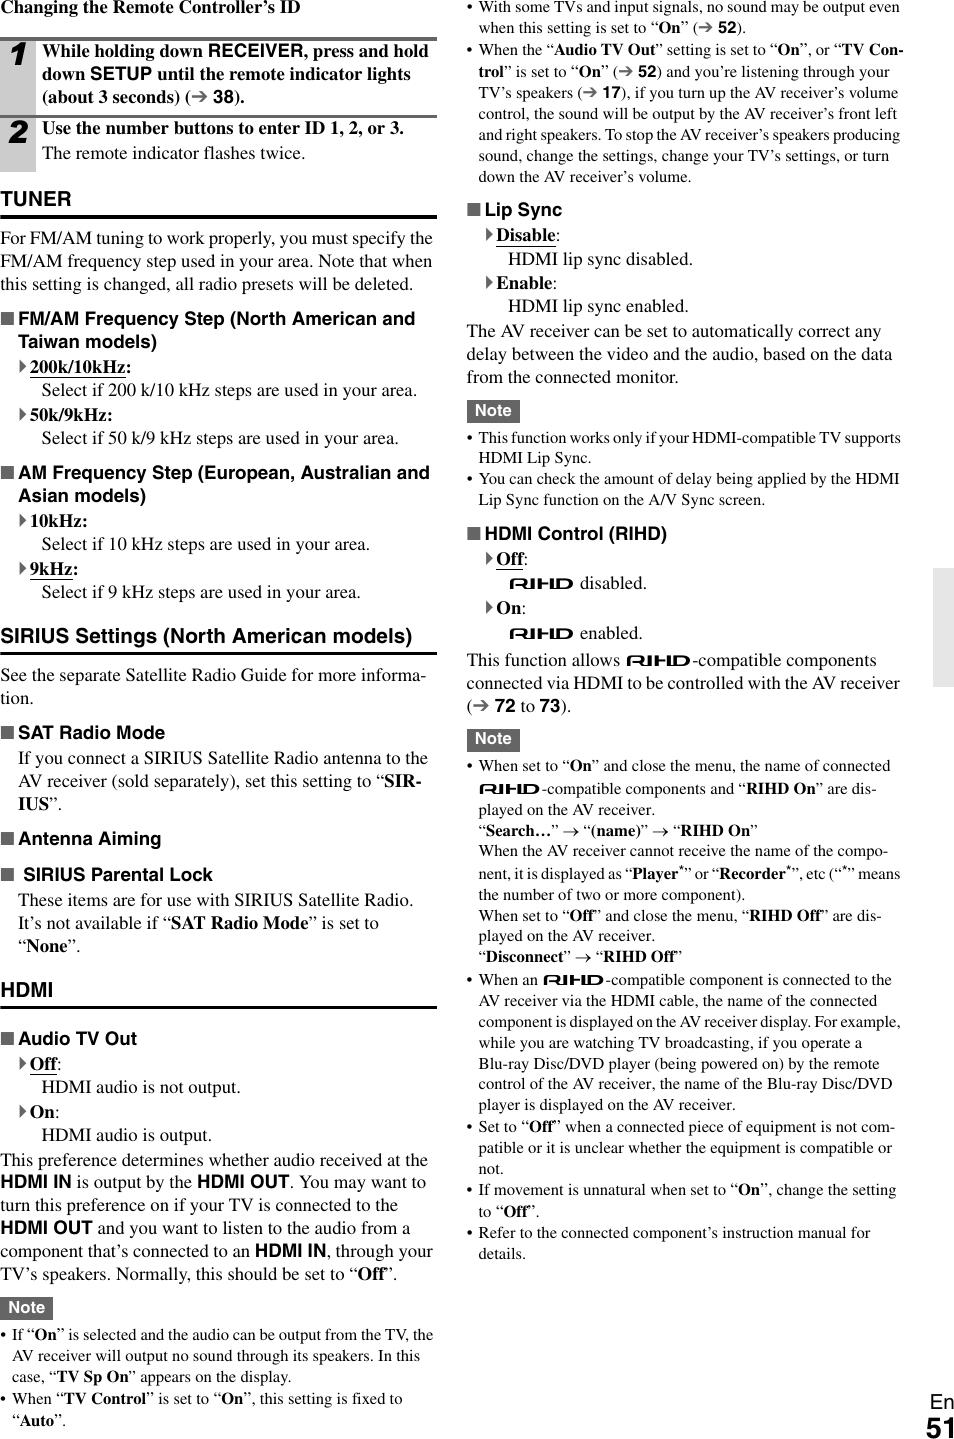 Onkyo Tx Sr608 Owner S Manual